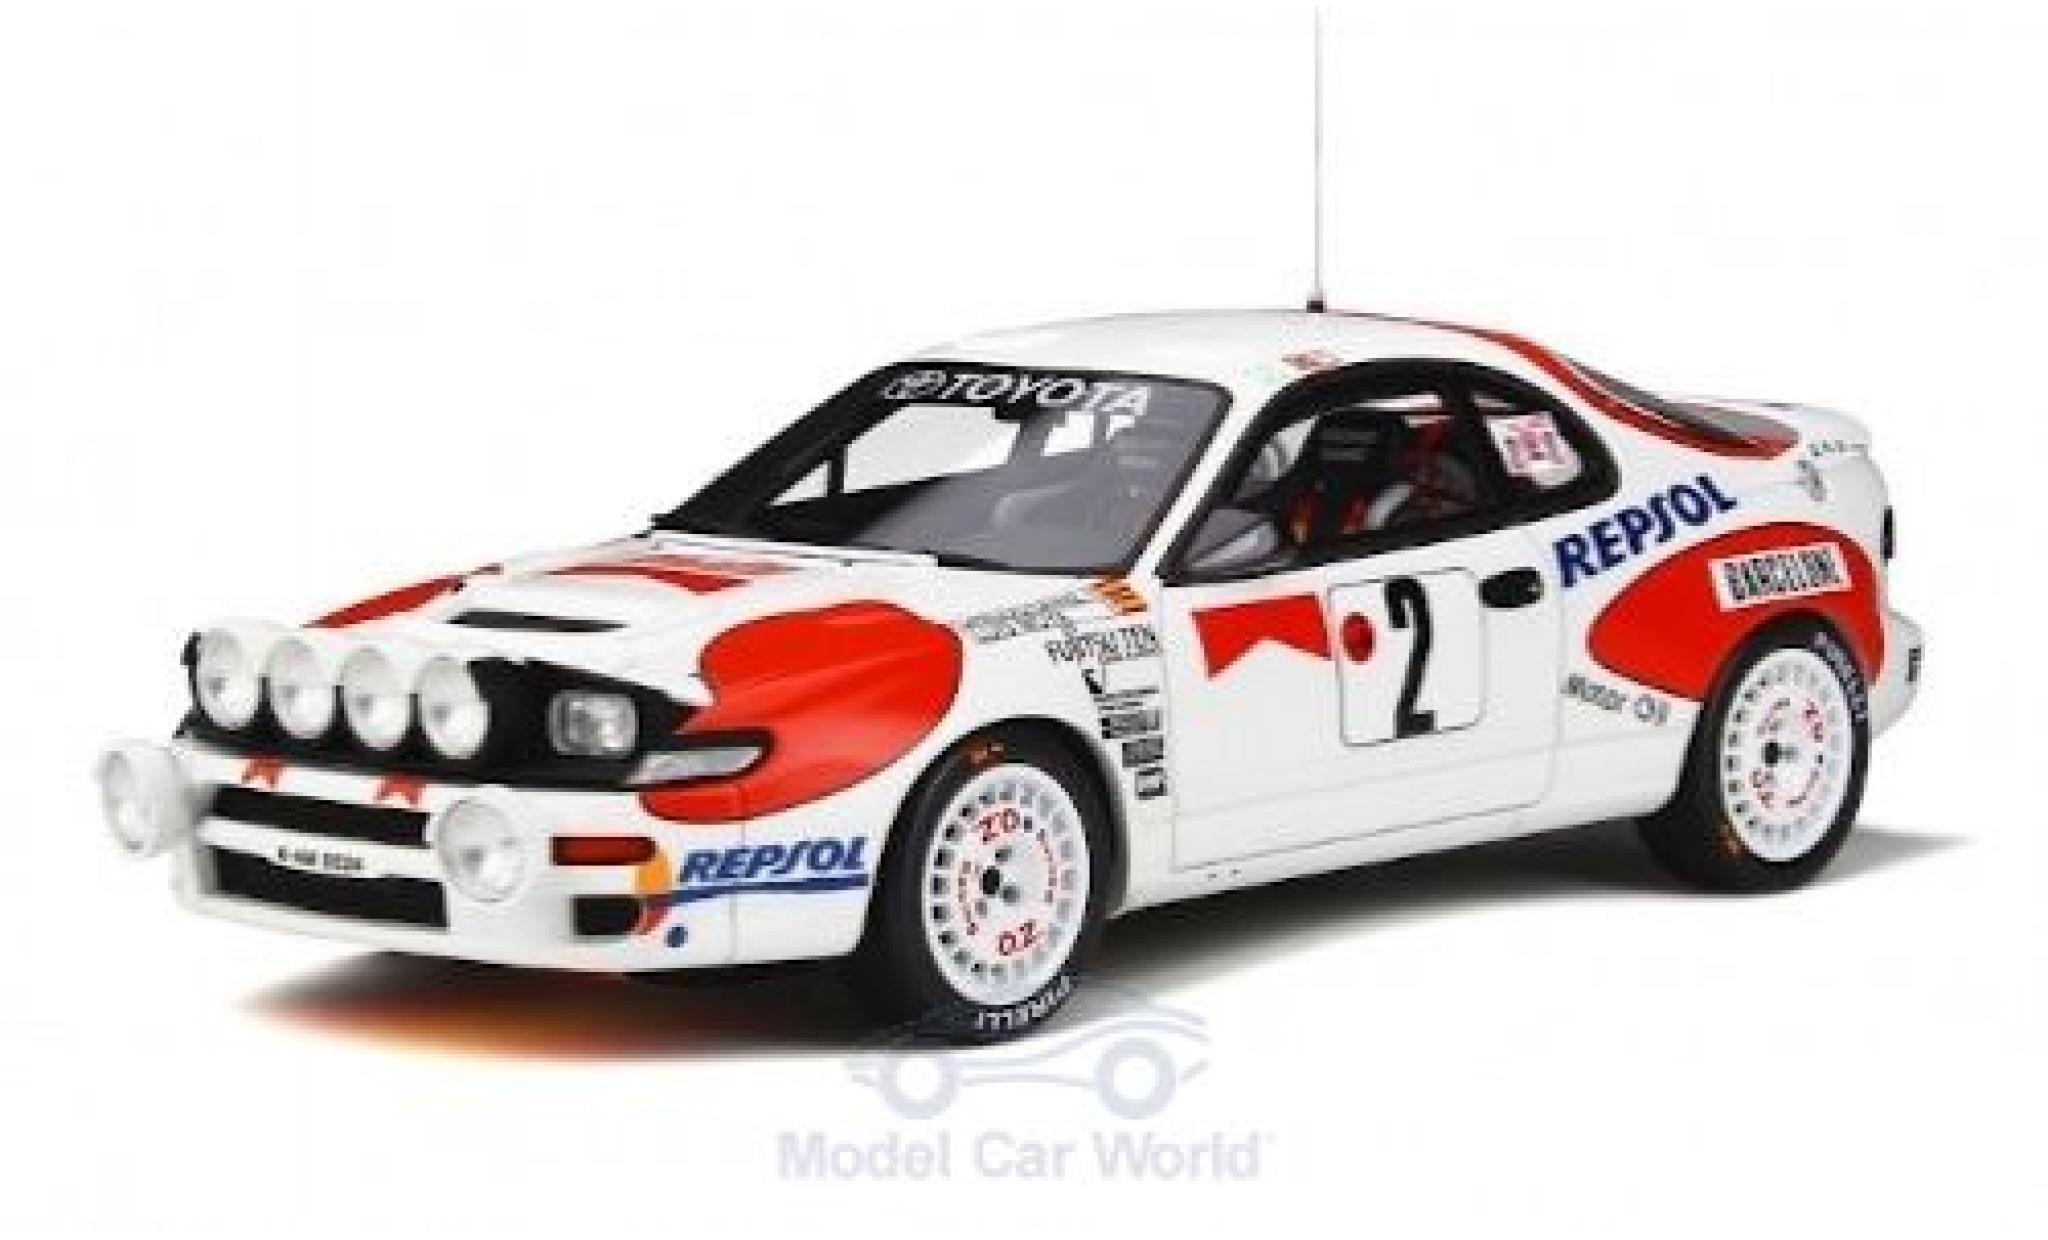 Toyota Celica 1/18 Ottomobile ST185 No.2 Rallye WM Rallye Monte Carlo 1992 C.Sainz/L.Moya